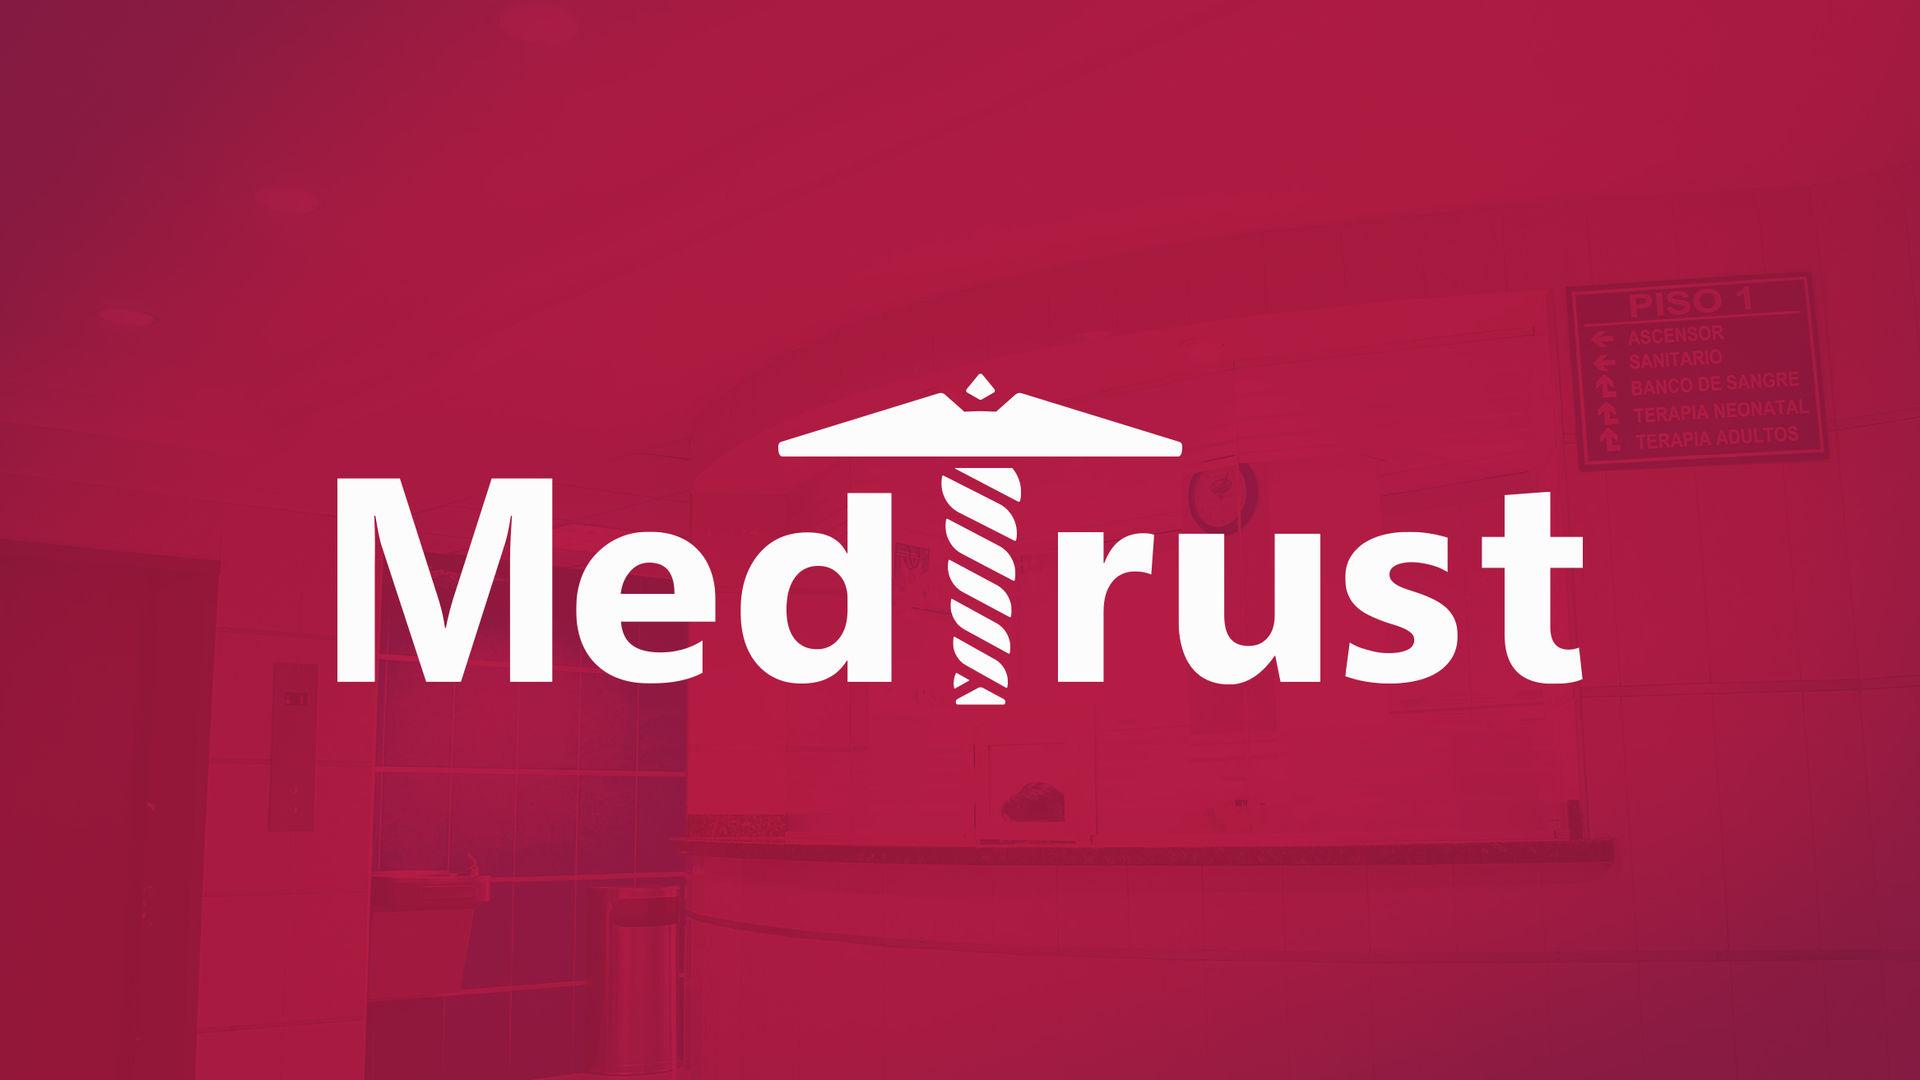 MedTrust Brand Identity Design